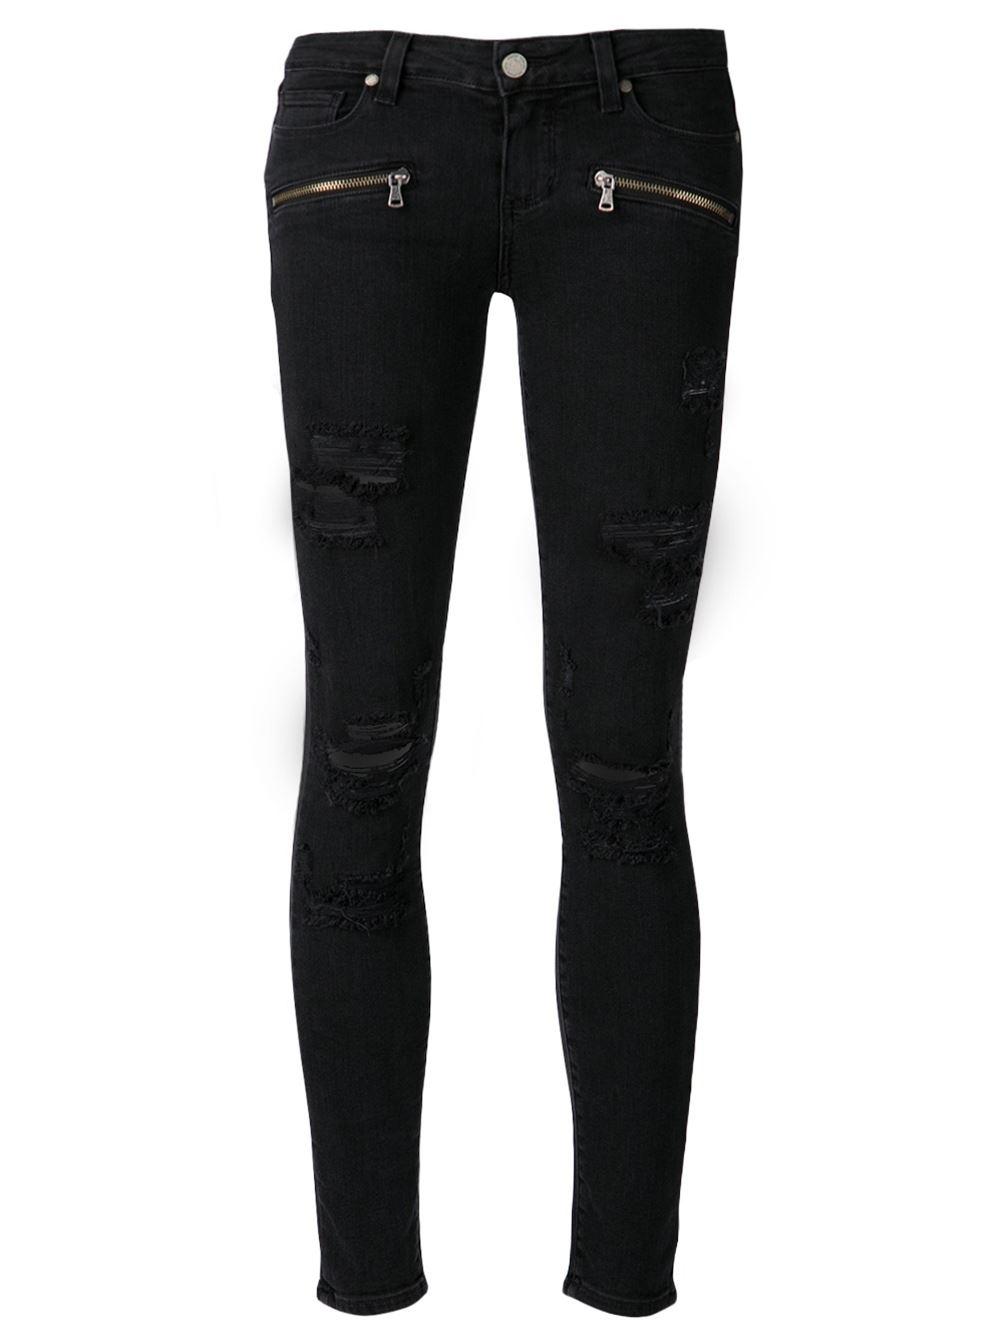 Paige 'ramone' ultra skinny jeans